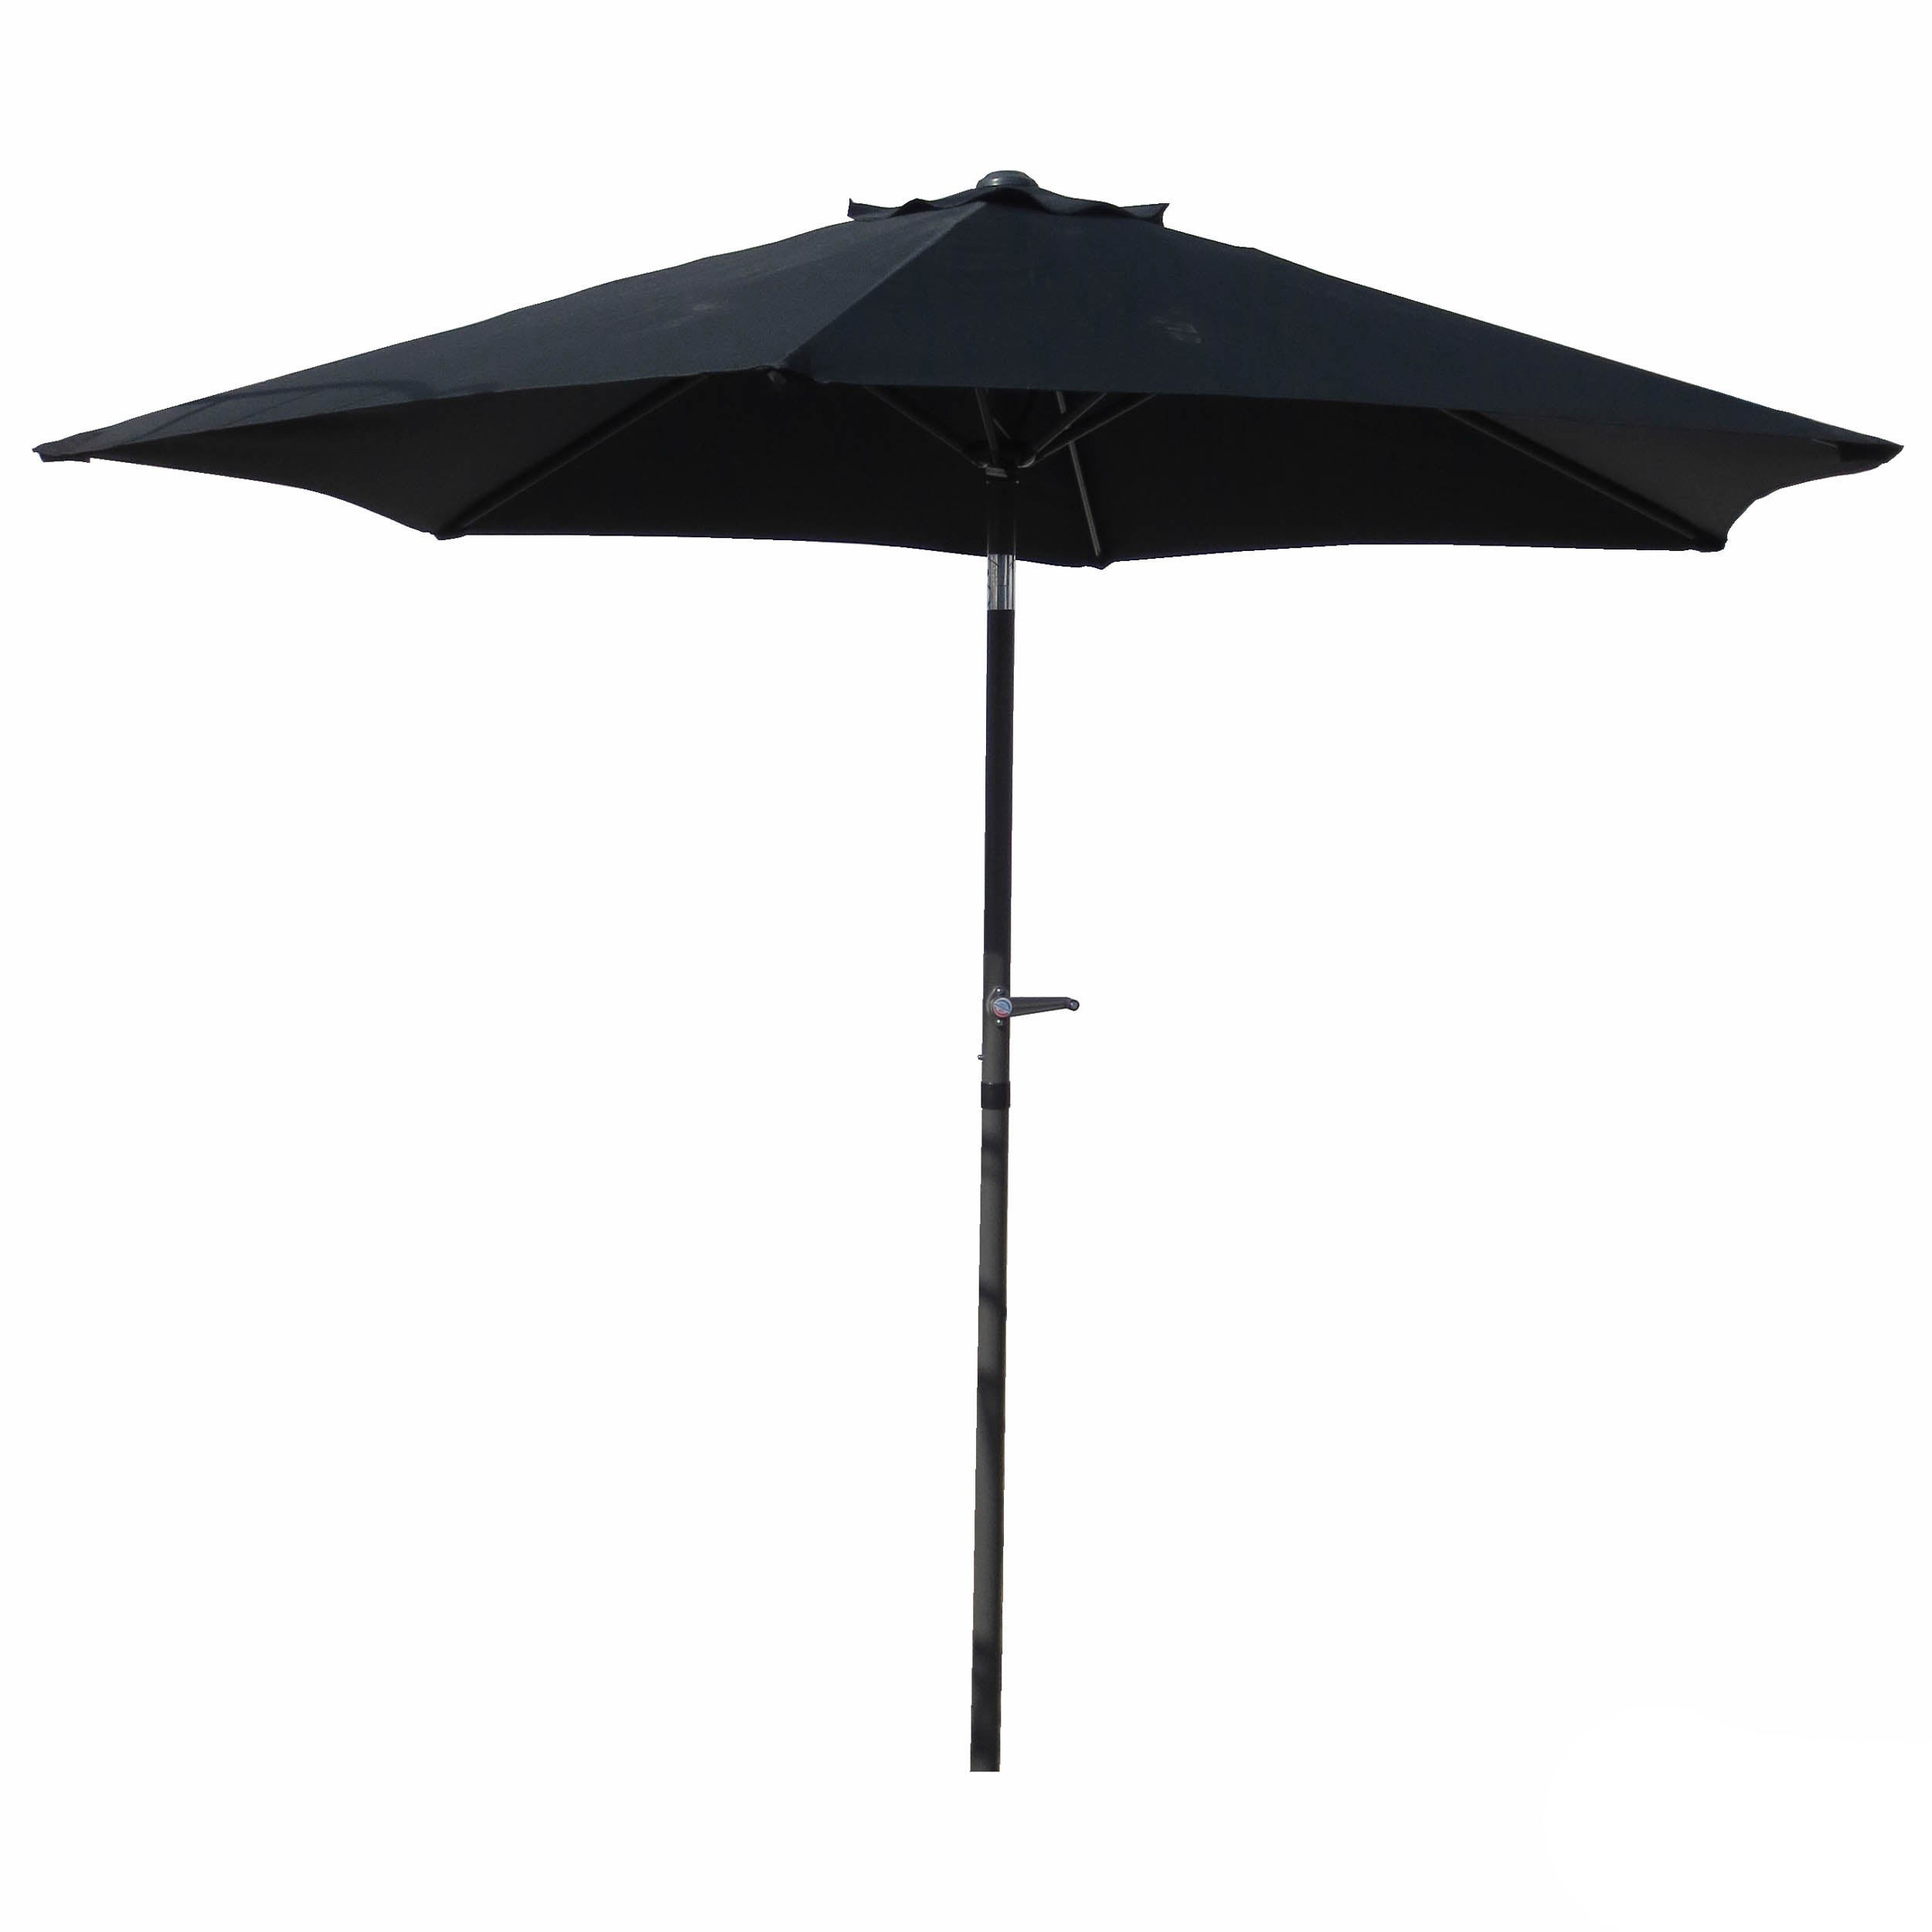 International Caravan Patio Umbrella 8 Foot Free Shipping Today 10578111